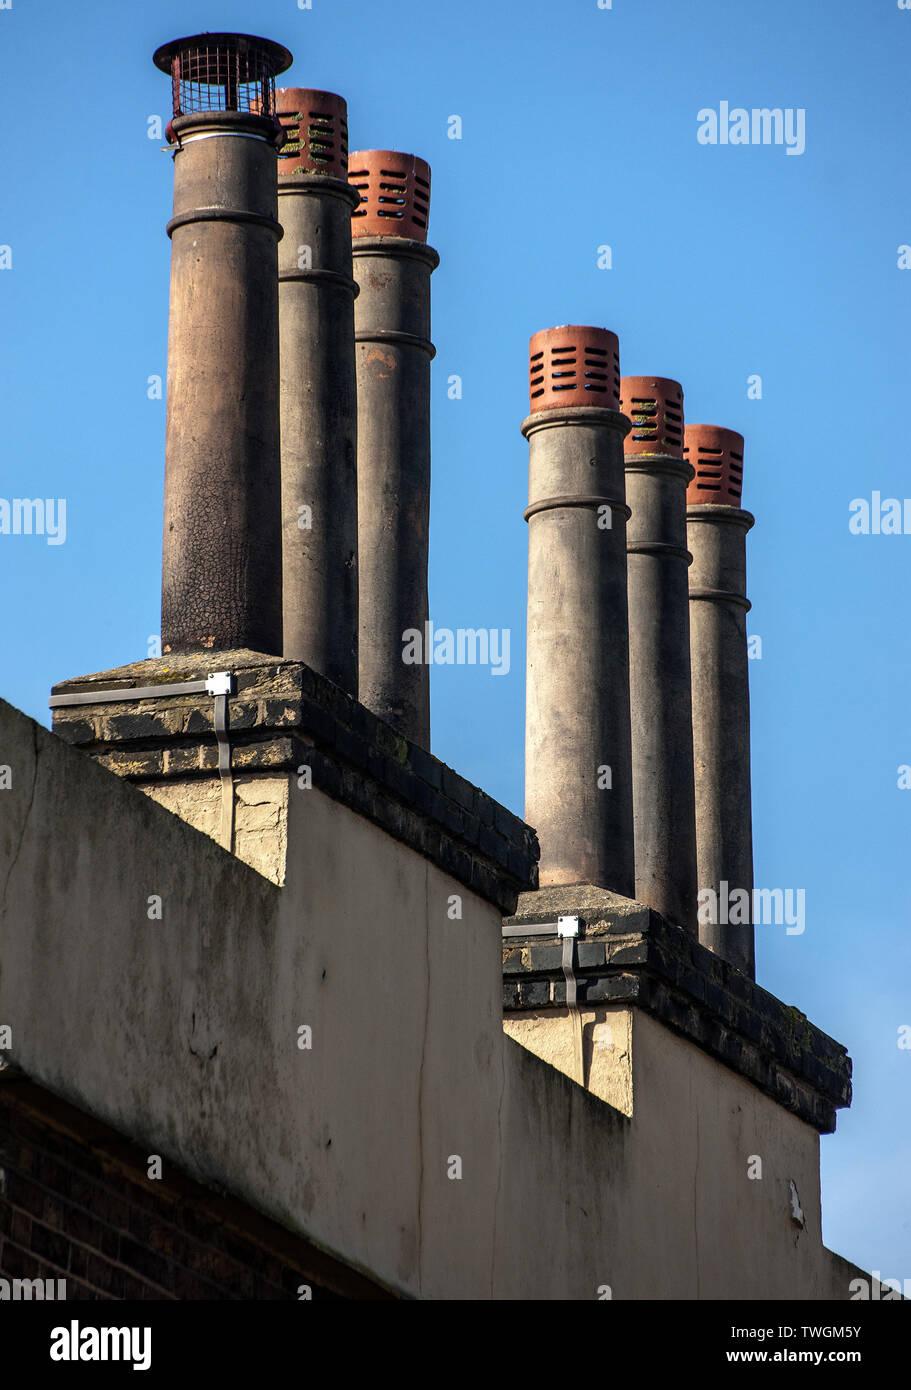 tall Louvred Chimney pots six chimney pots on rectagle stack. - Stock Image